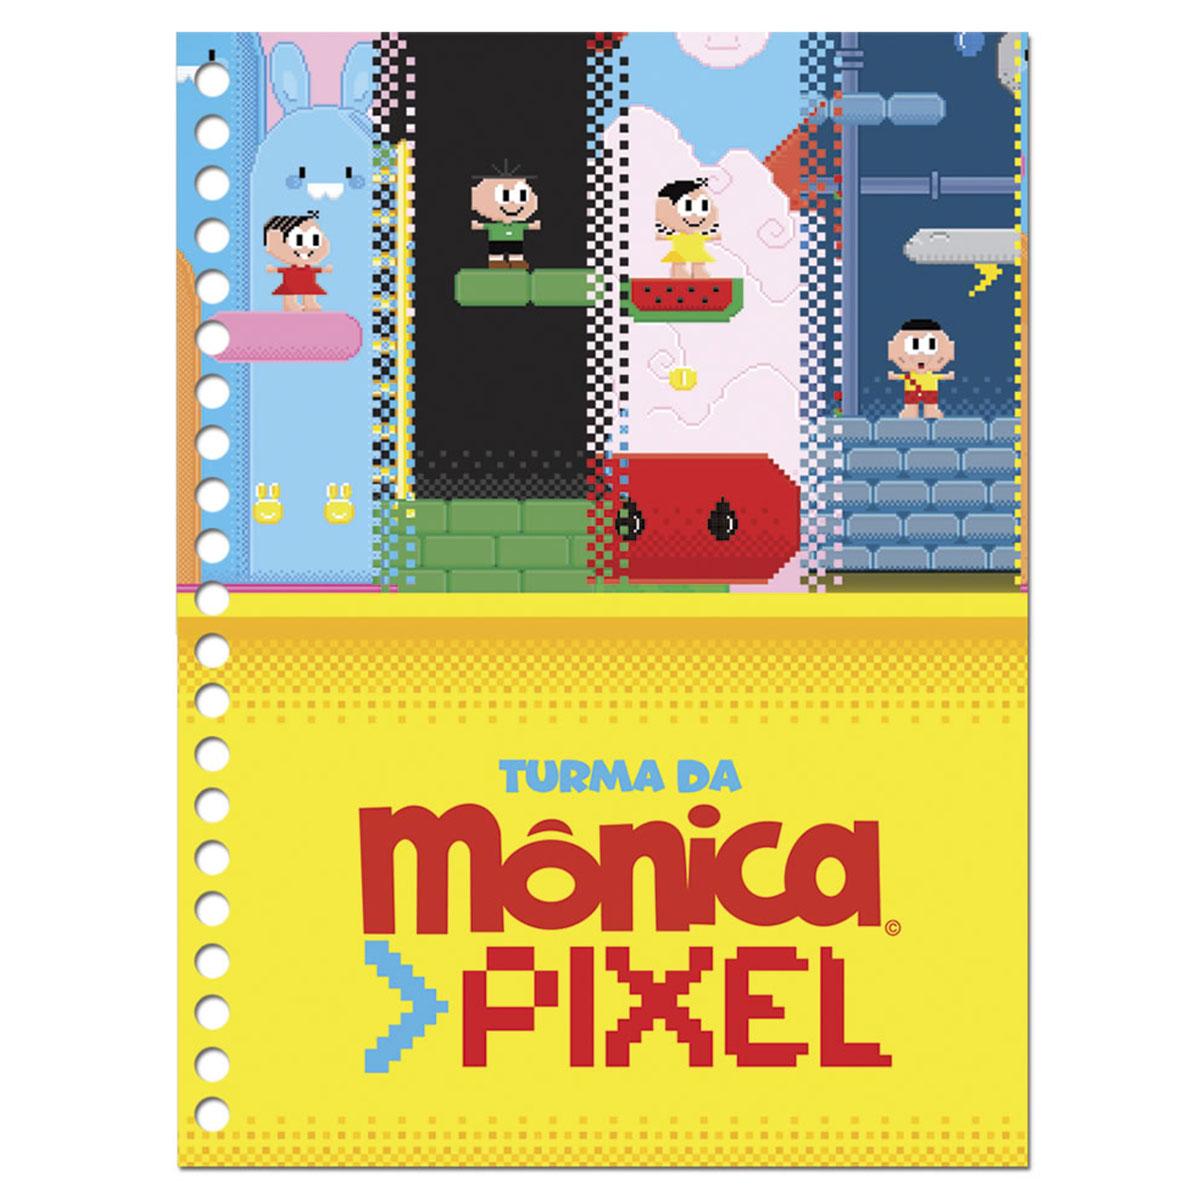 Agenda Diária 2016 Turma da Mônica Pixel Magali